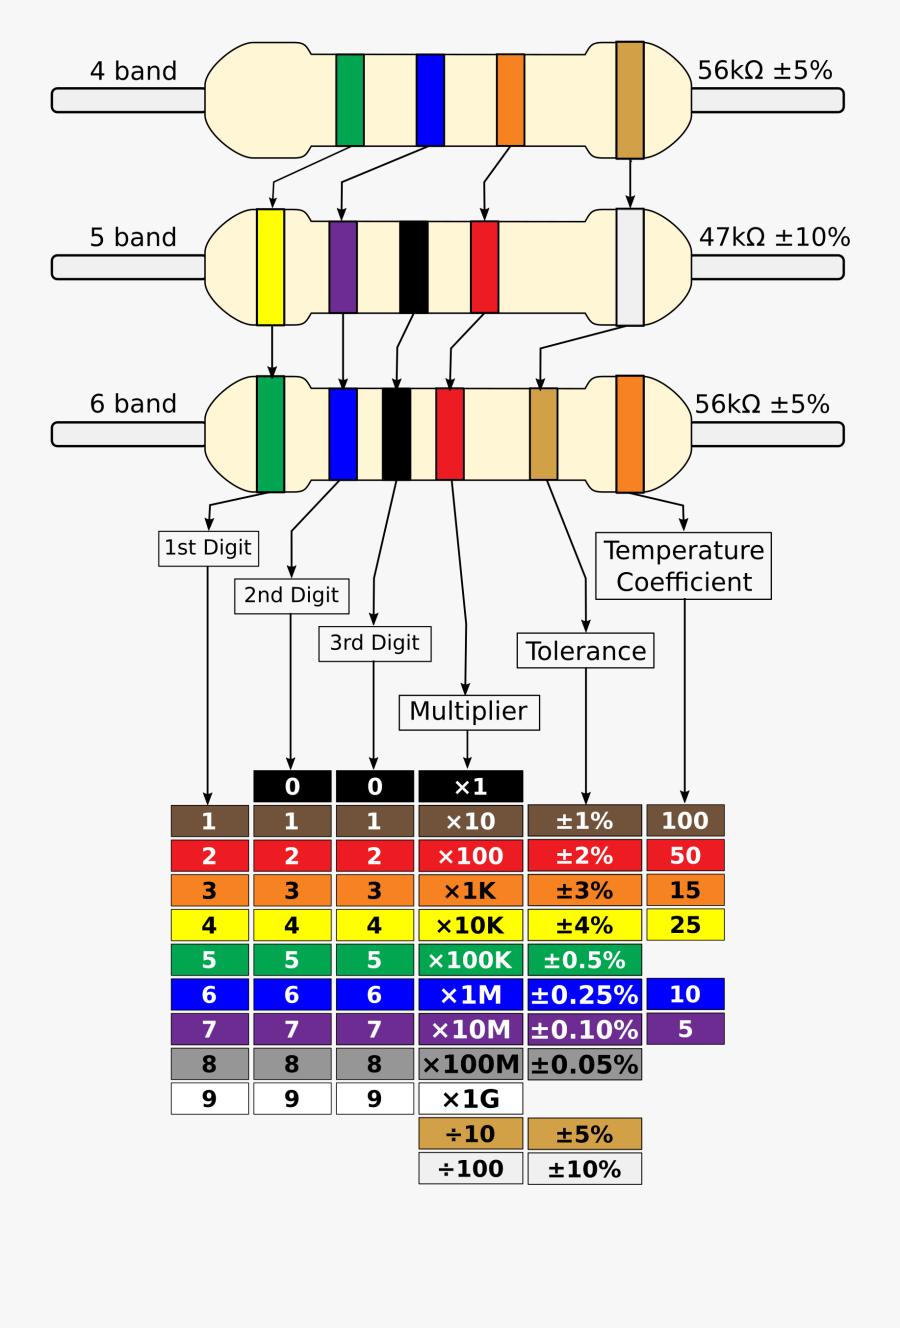 Resistor Colour Chart 4, 5, 6 Bands Clip Arts - 4 5 6 Band Resistor, Transparent Clipart